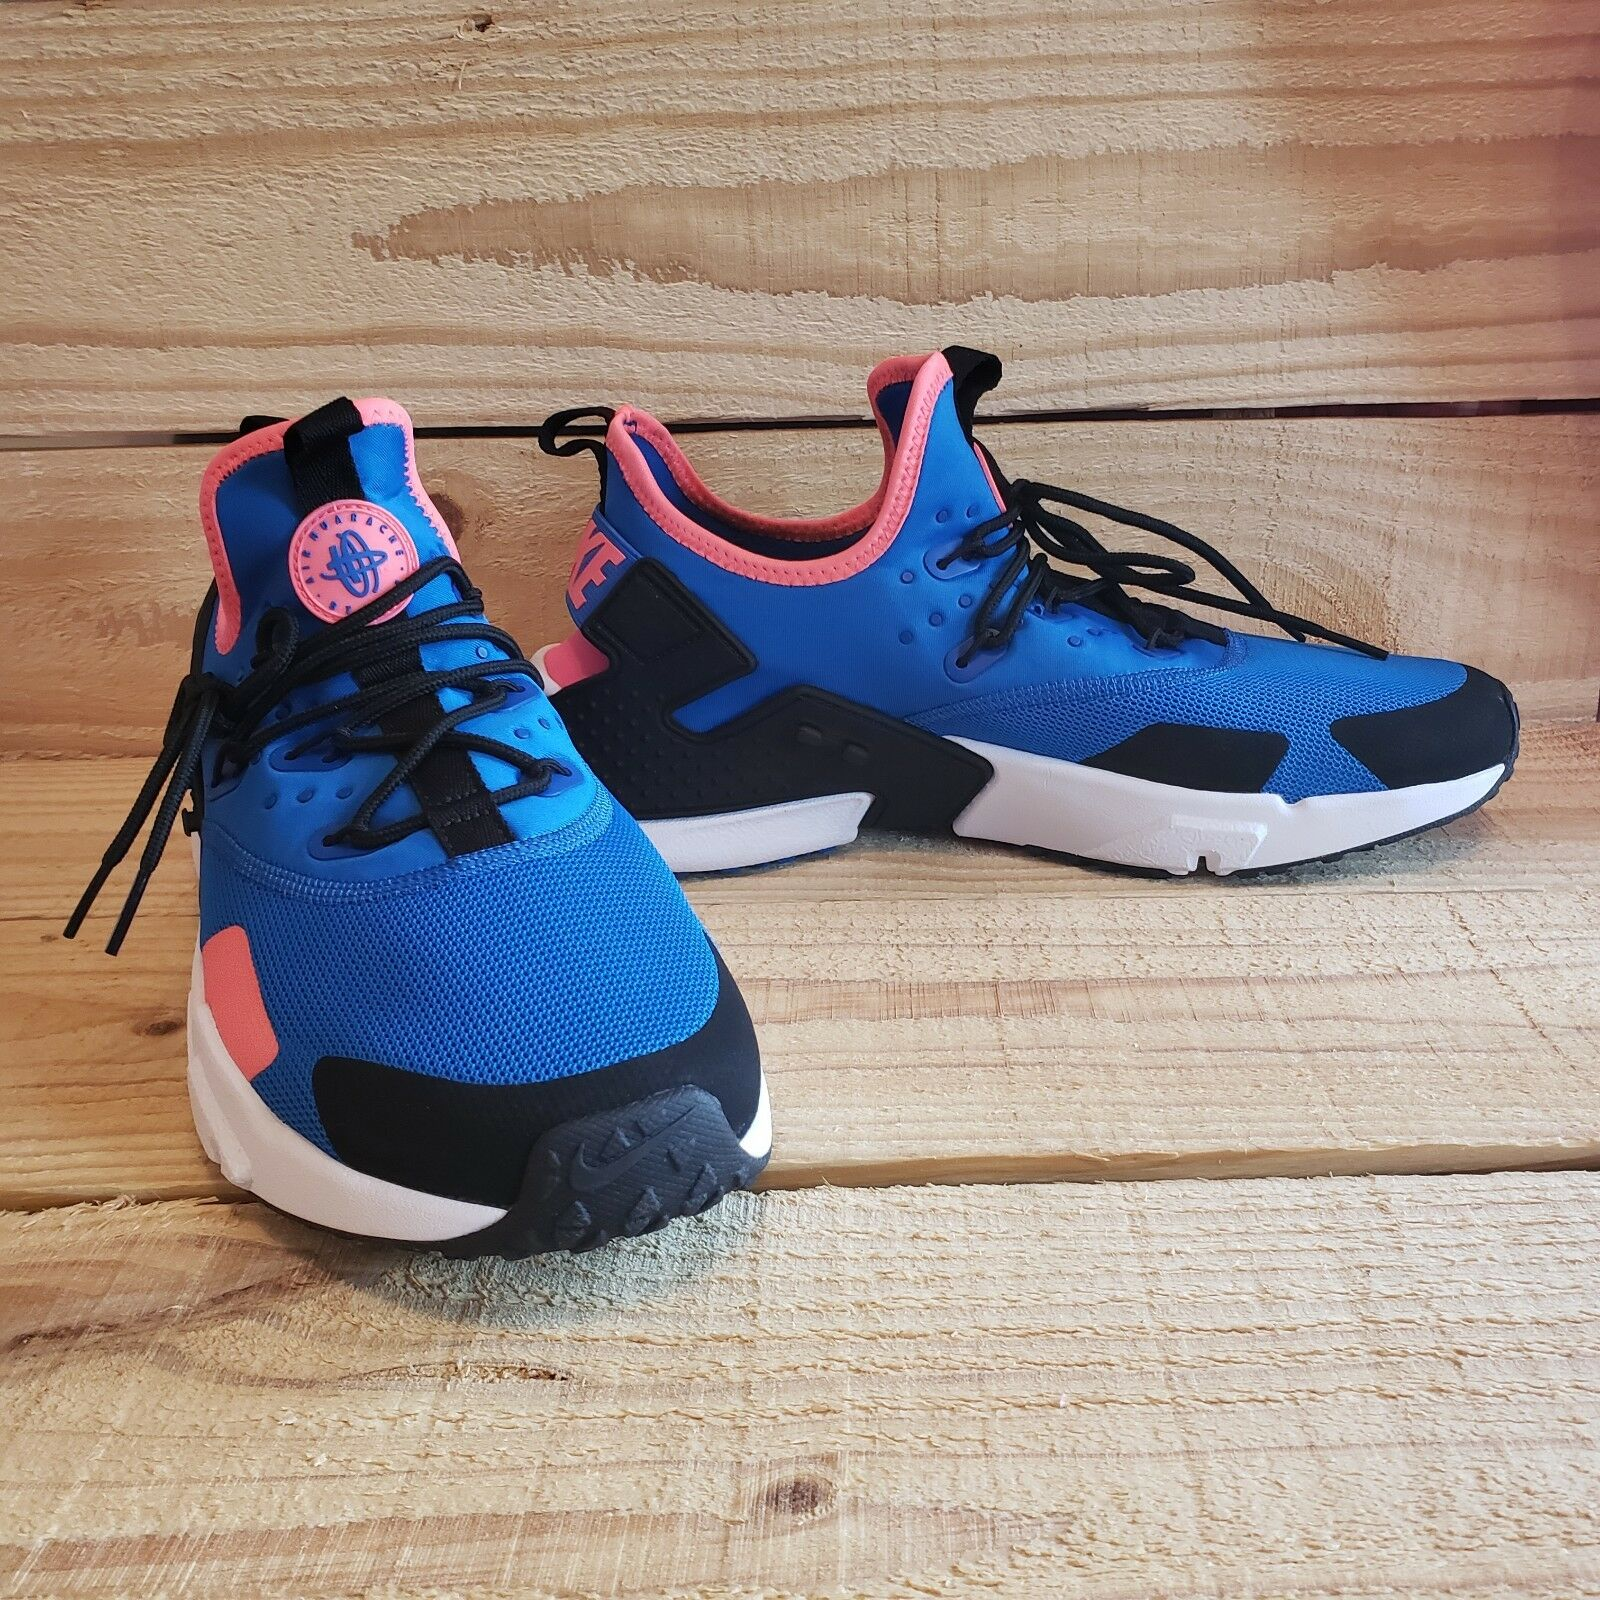 wholesale dealer 3fe25 740c3 Nike Air Huarache Drift Mens AH7334 AH7334 AH7334 403 Running shoes Size  bluee Nebula Black 87f153